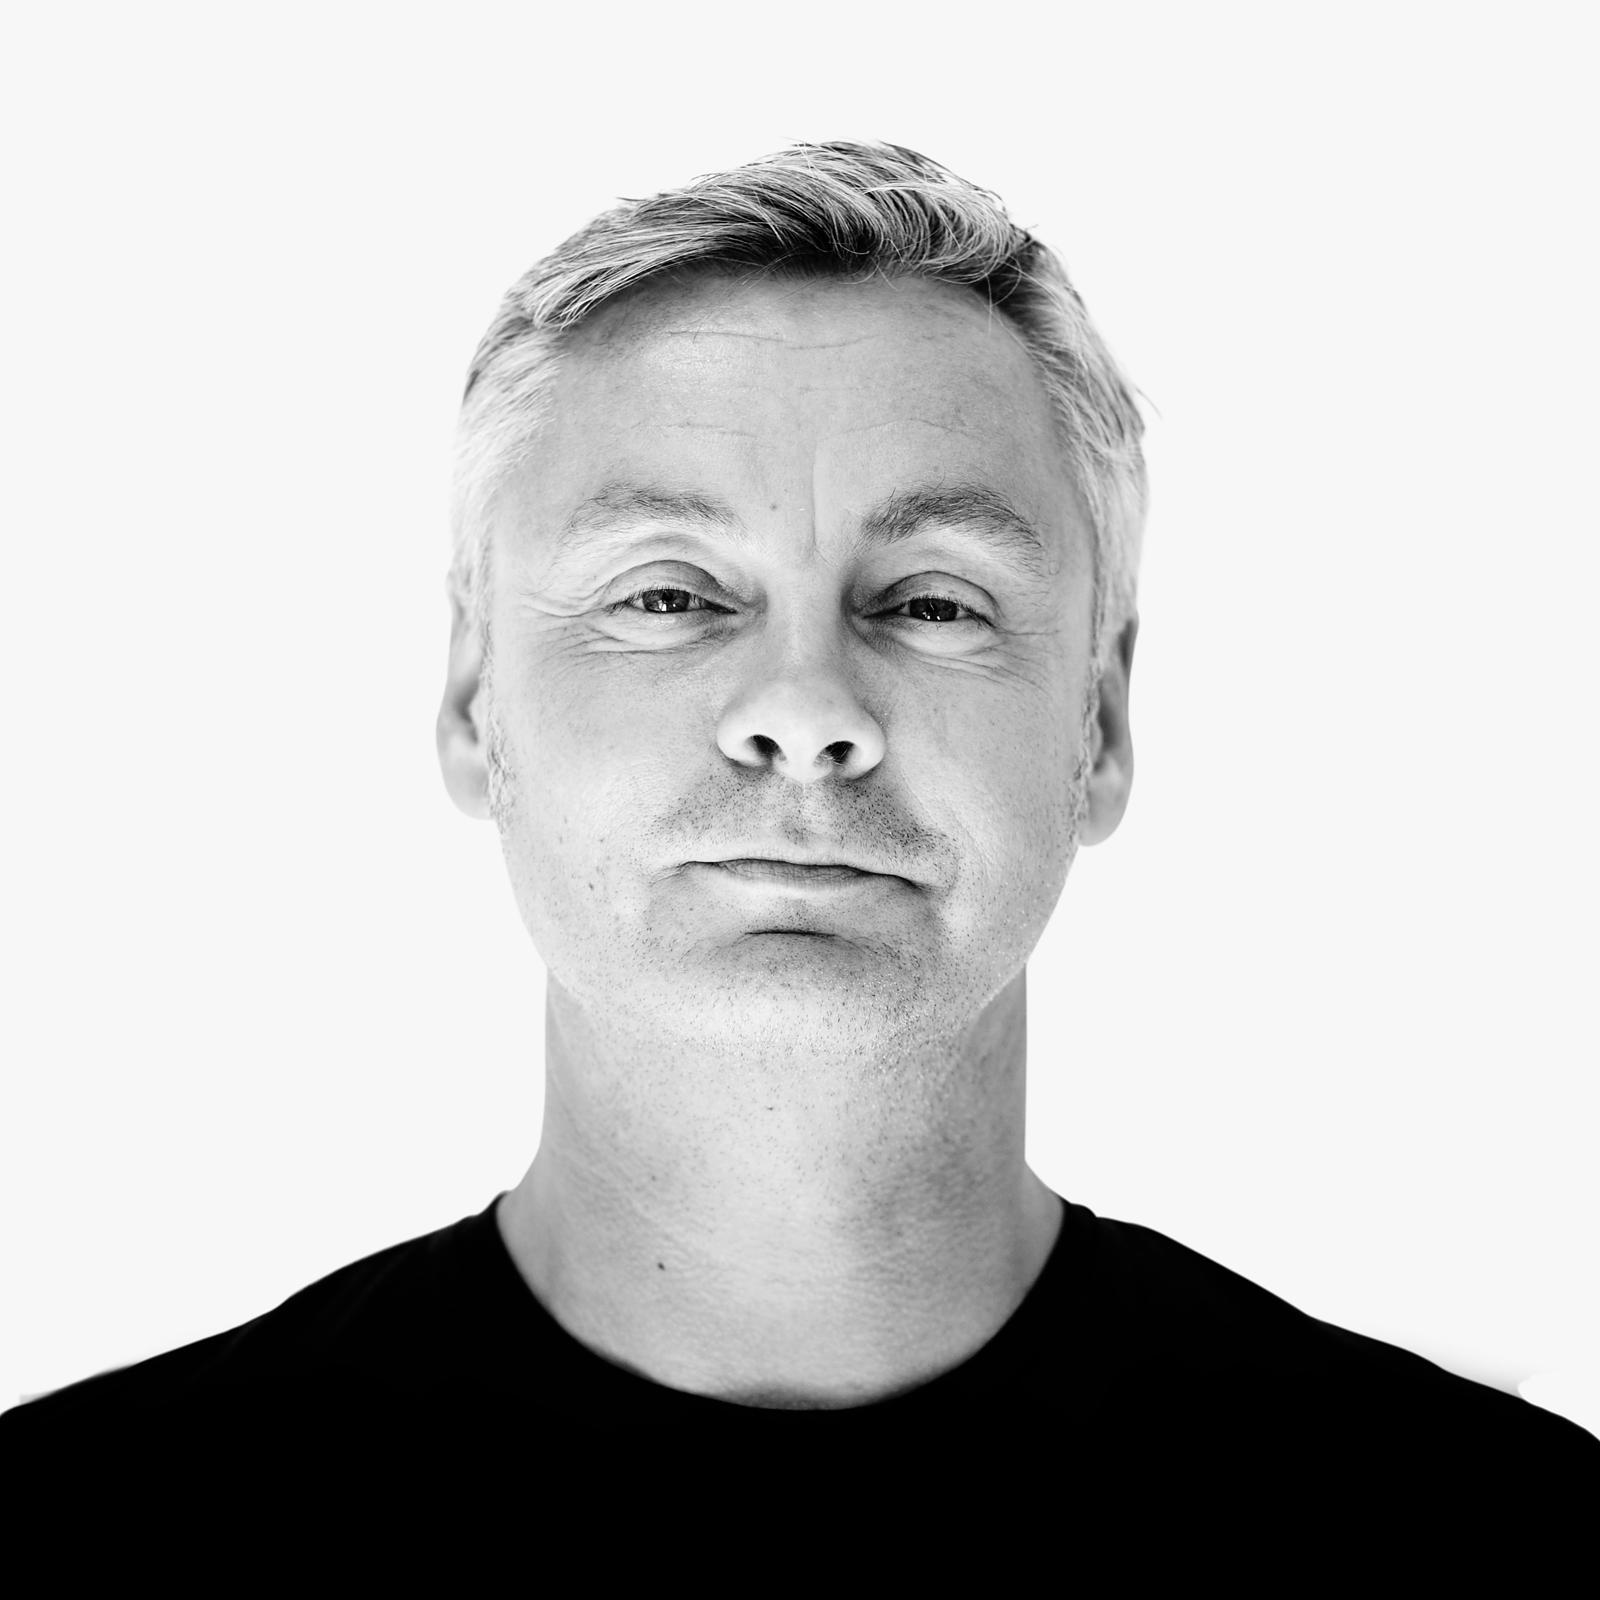 Portrait of Ulf Angermann